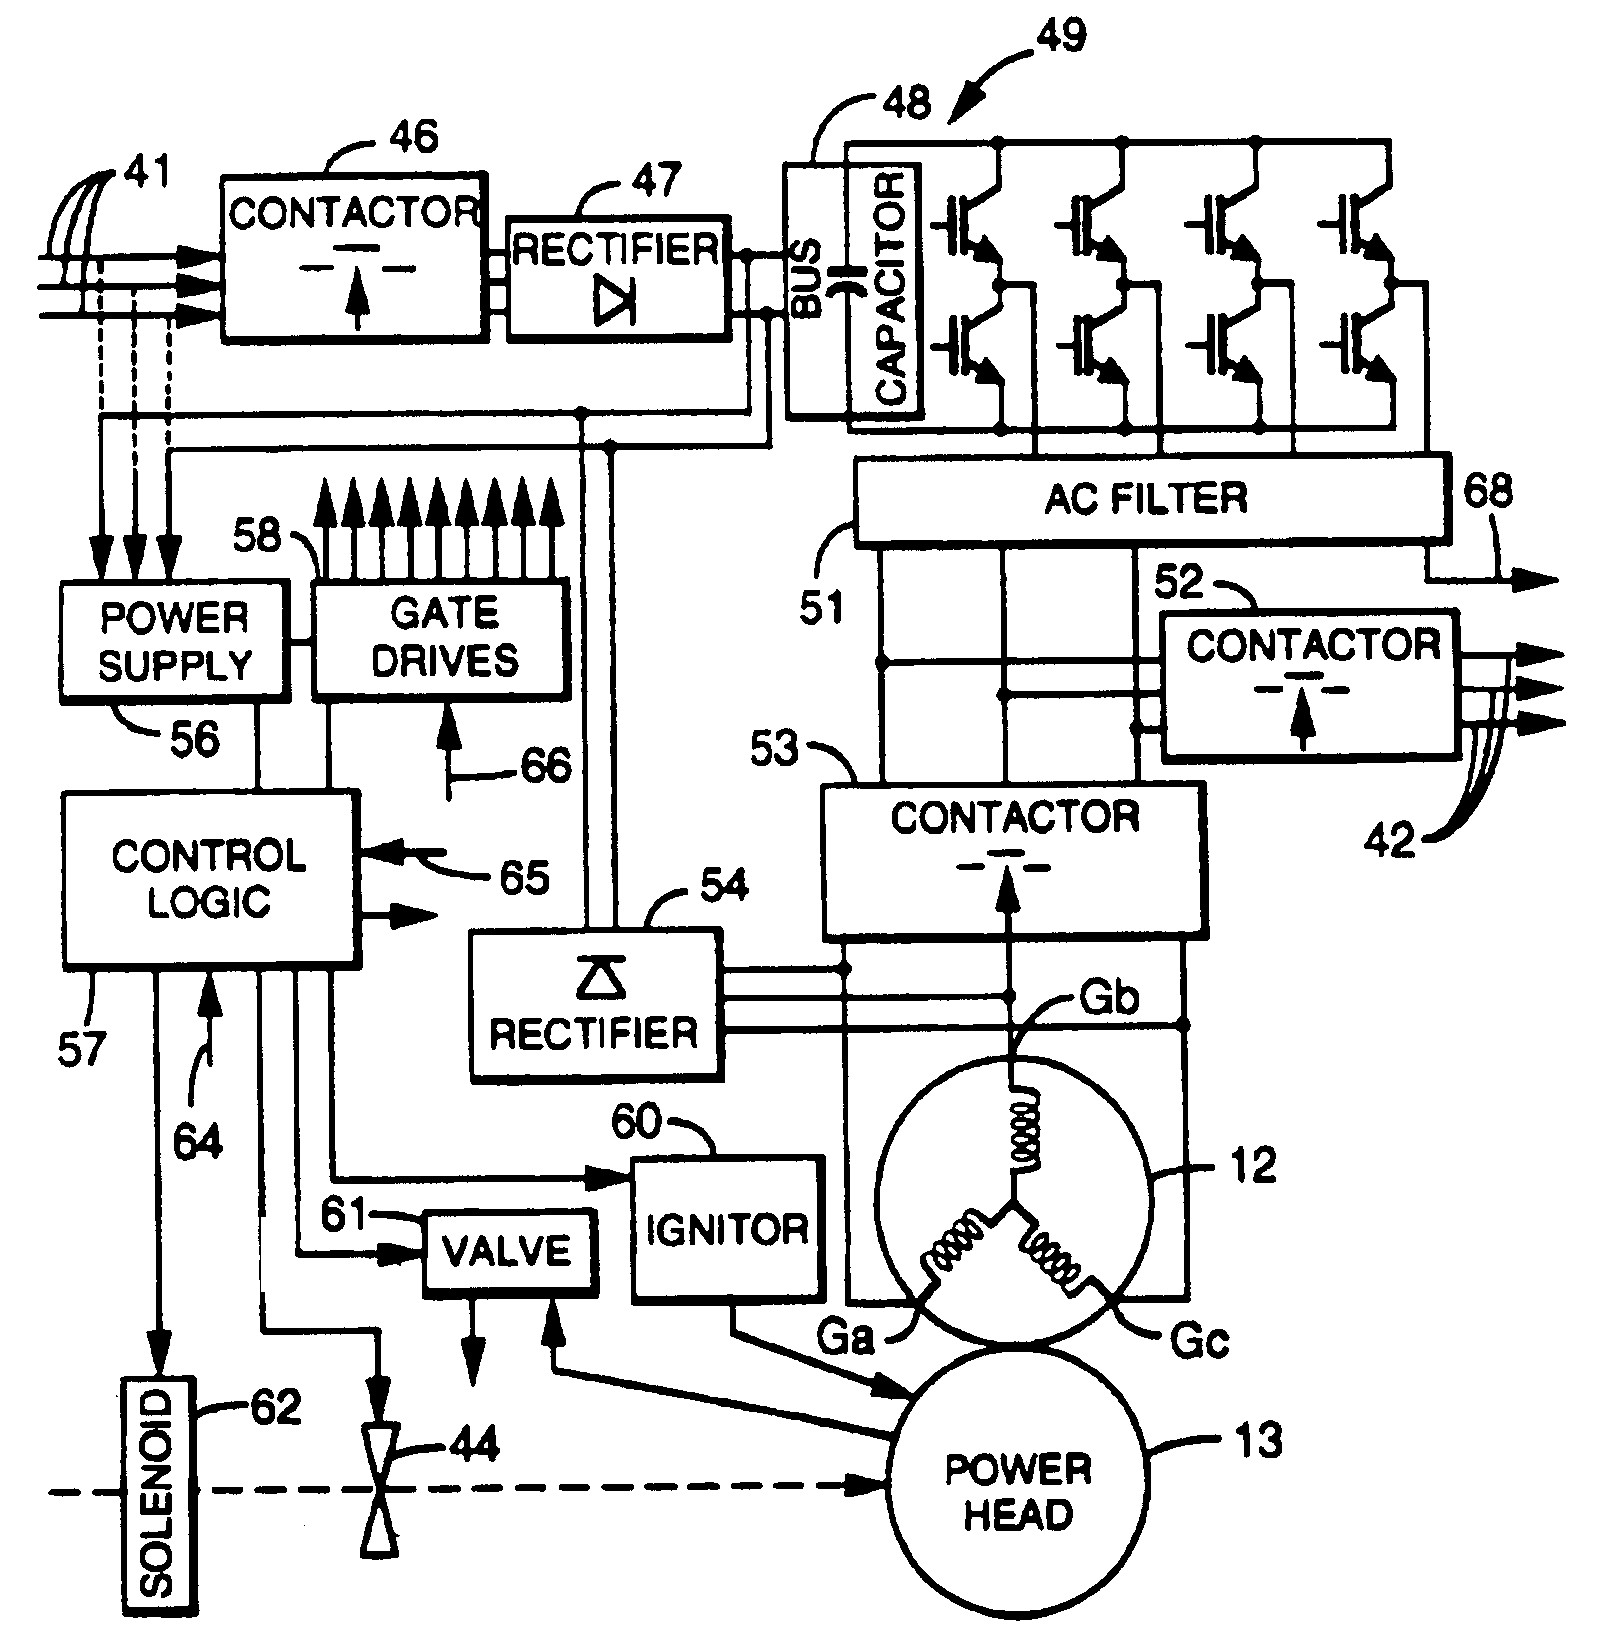 USRE040713 20090519 D00000 magneti marelli alternator wiring diagram delco alternator wiring magneti marelli alternator wiring diagram at bayanpartner.co